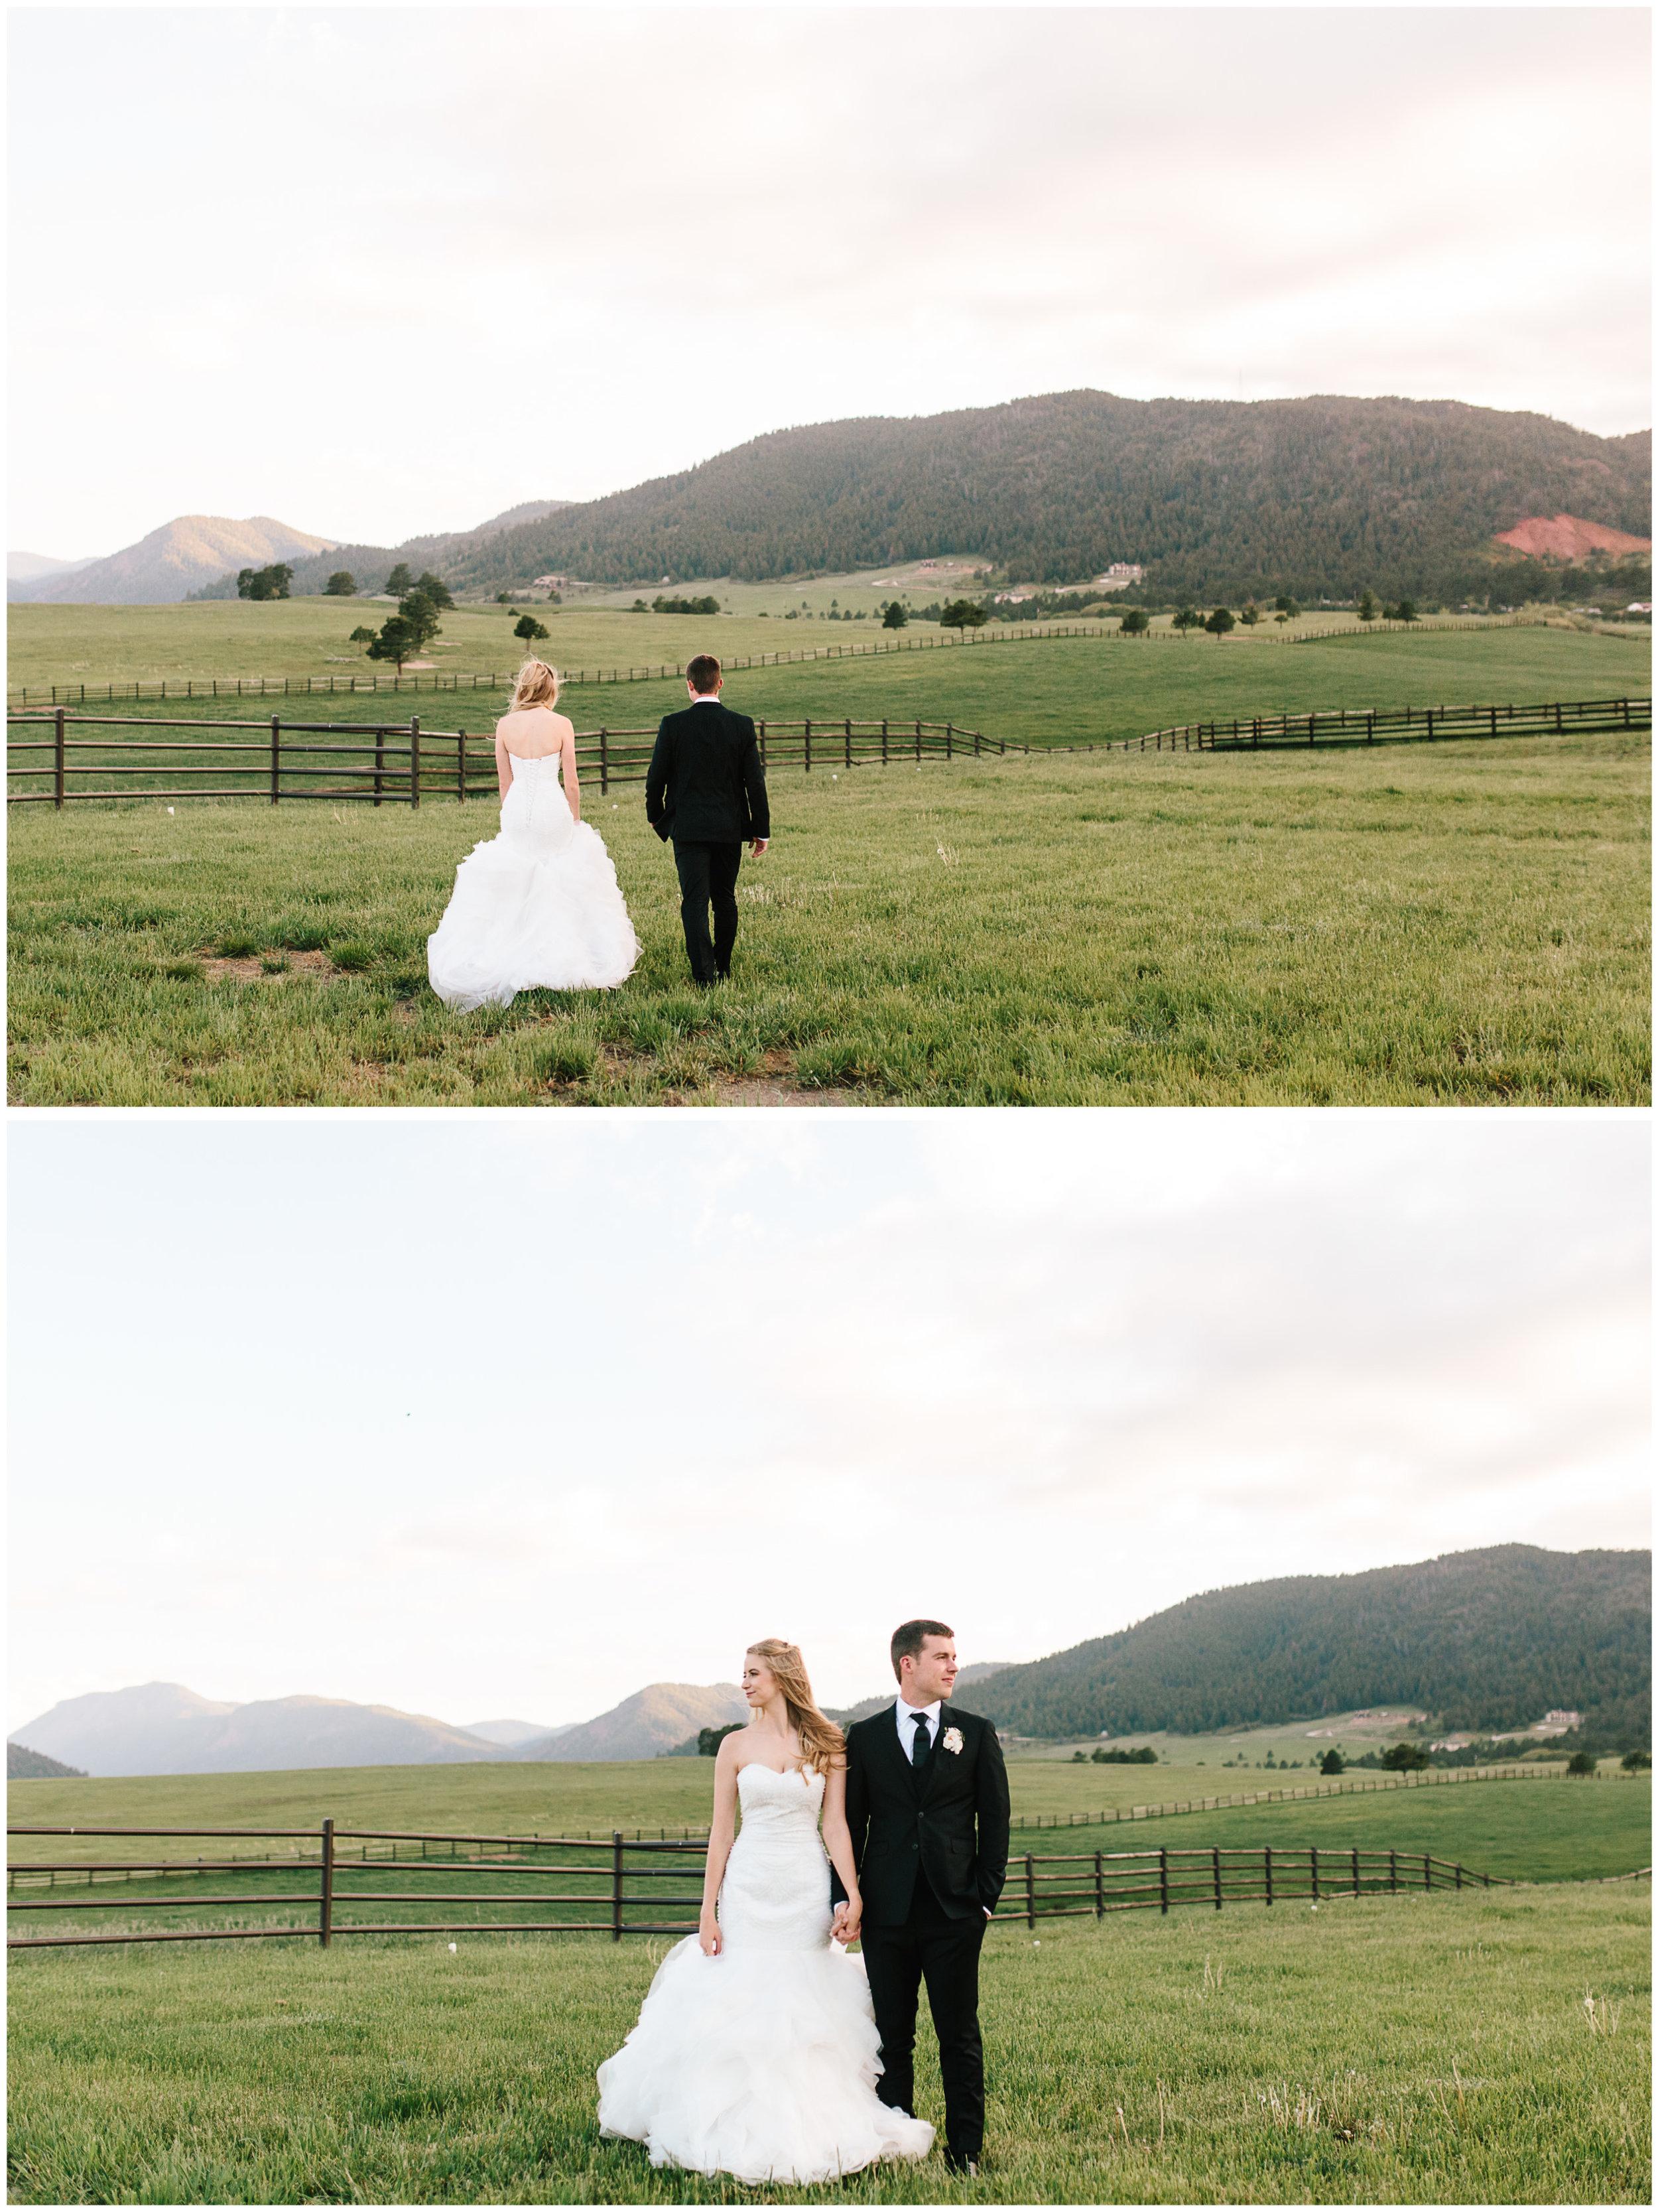 spruce_mountain_ranch_wedding_58.jpg